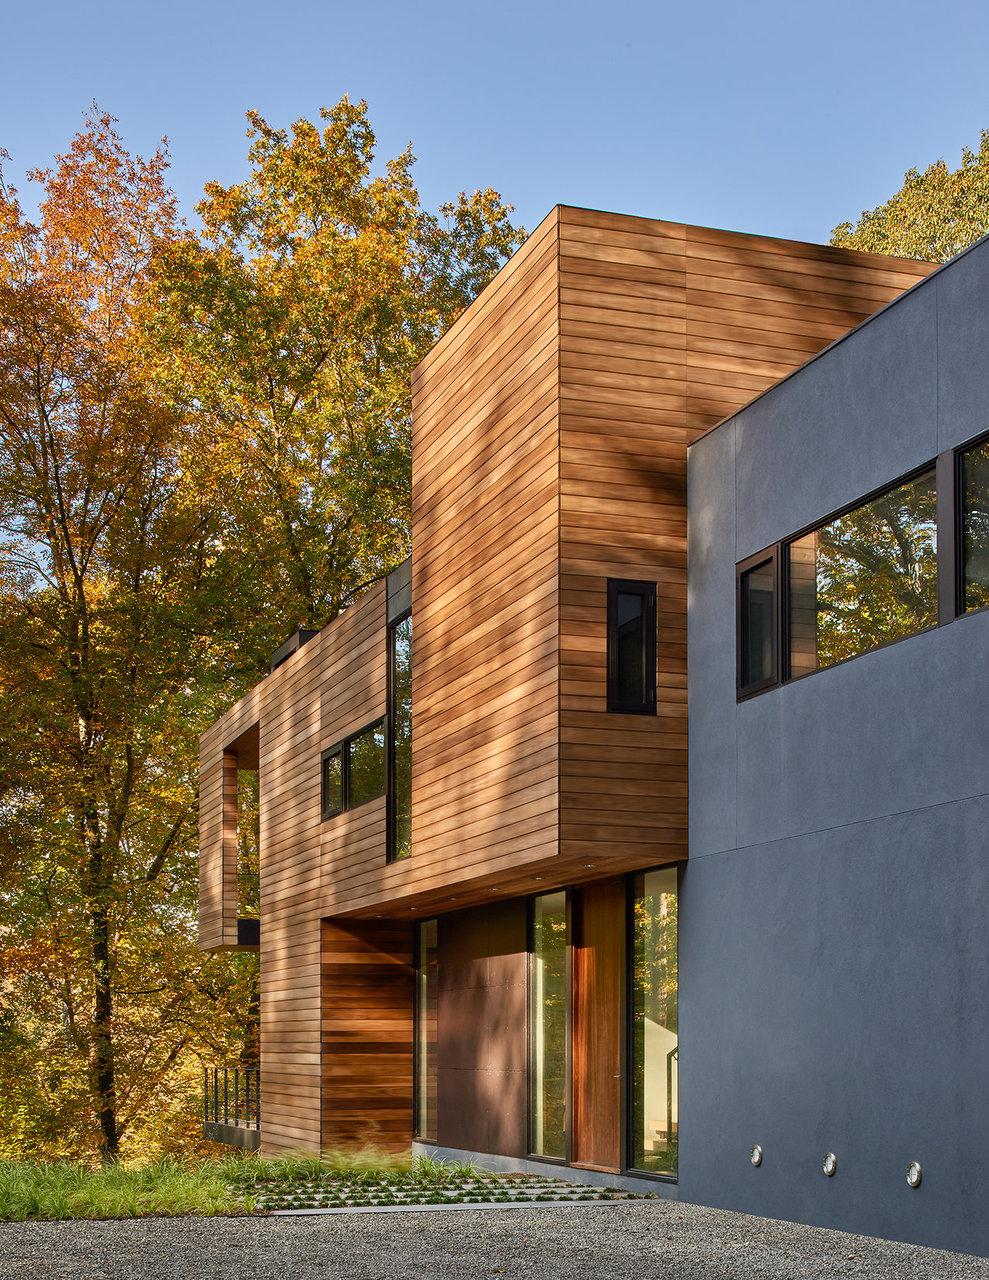 Remembering Robert Venturi, the US architect who said